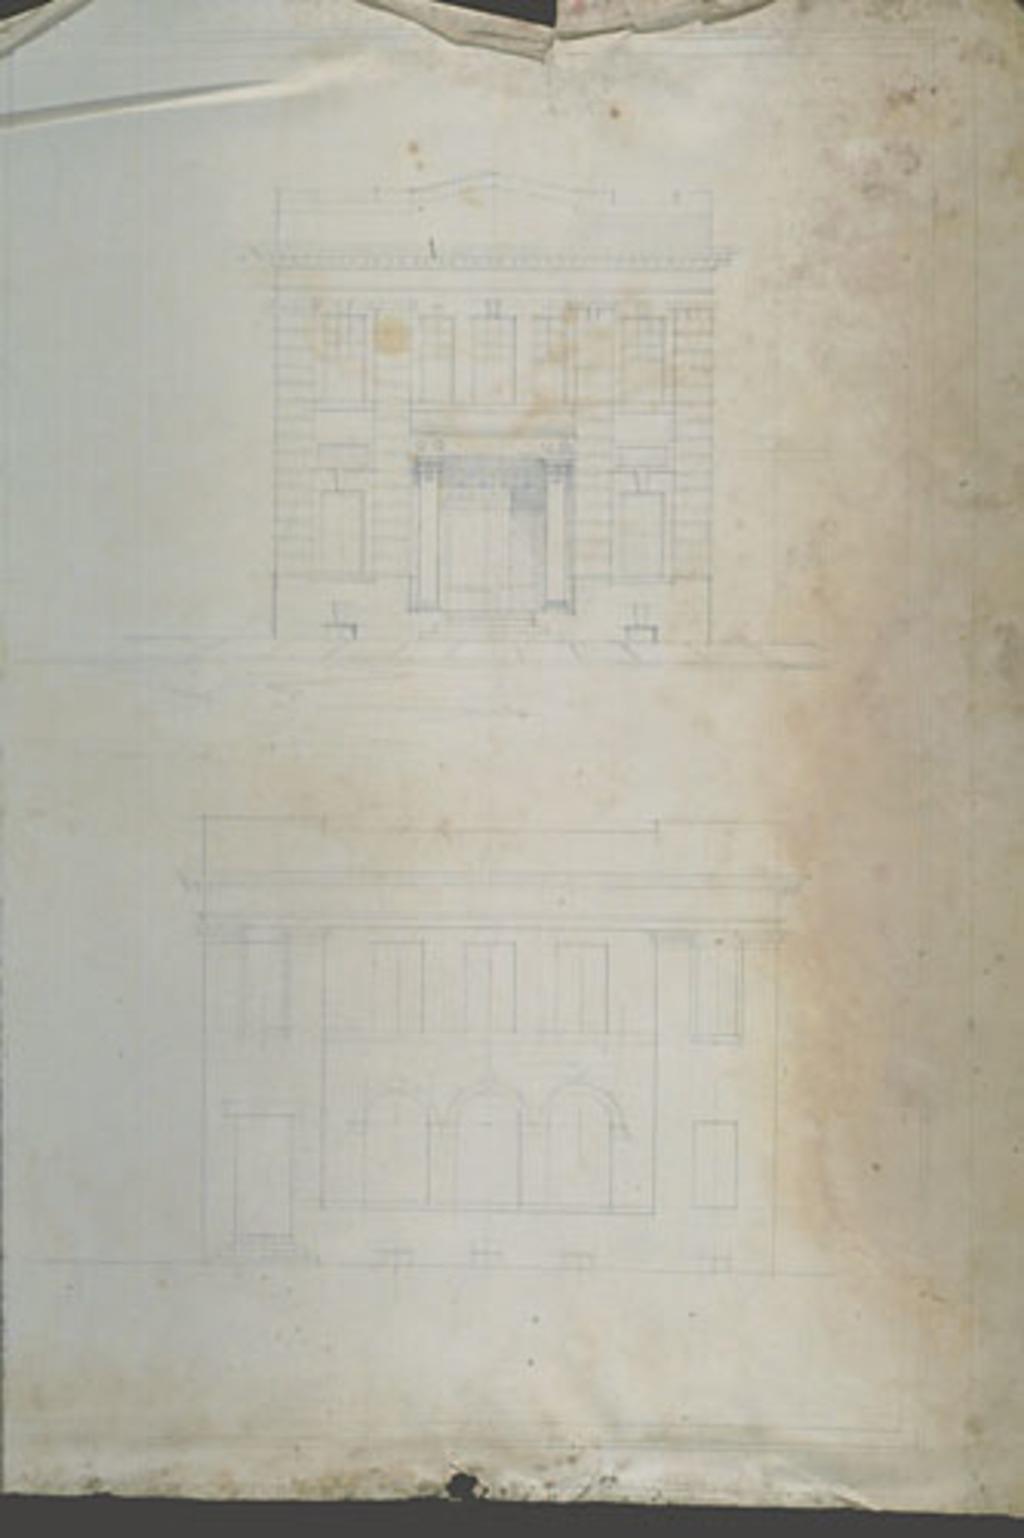 Plan de deux façades